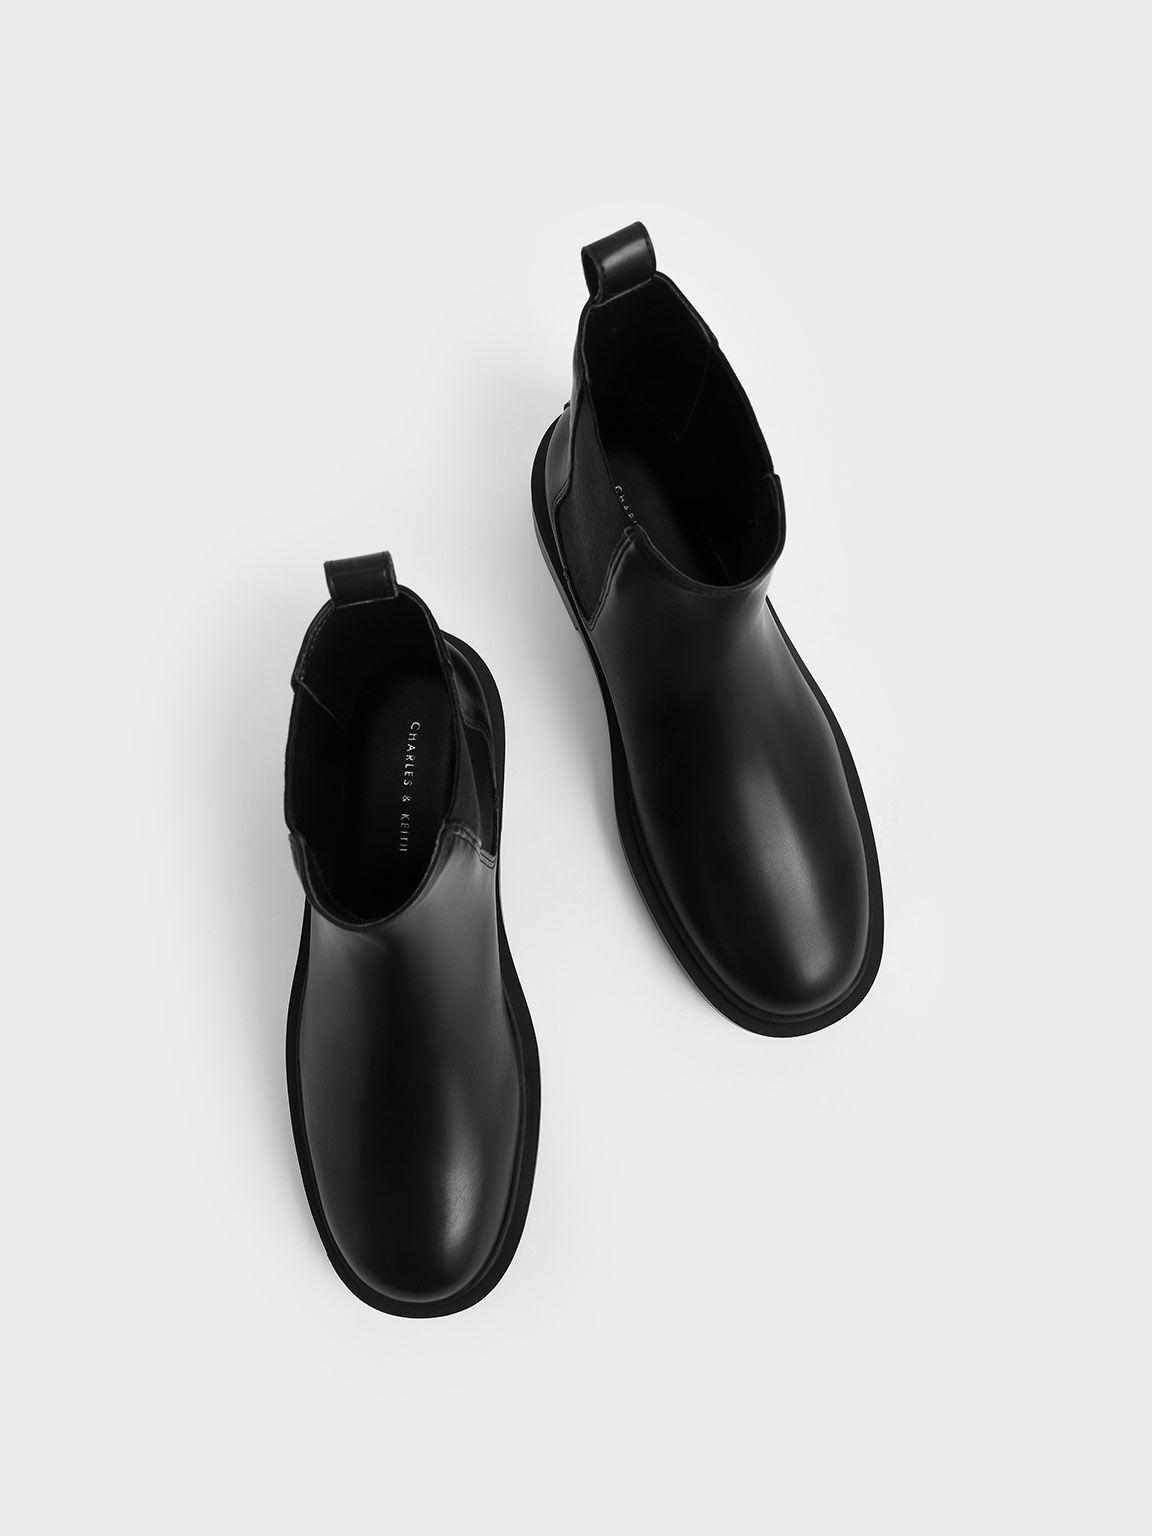 Chelsea Block-Heel Boots, Black, hi-res